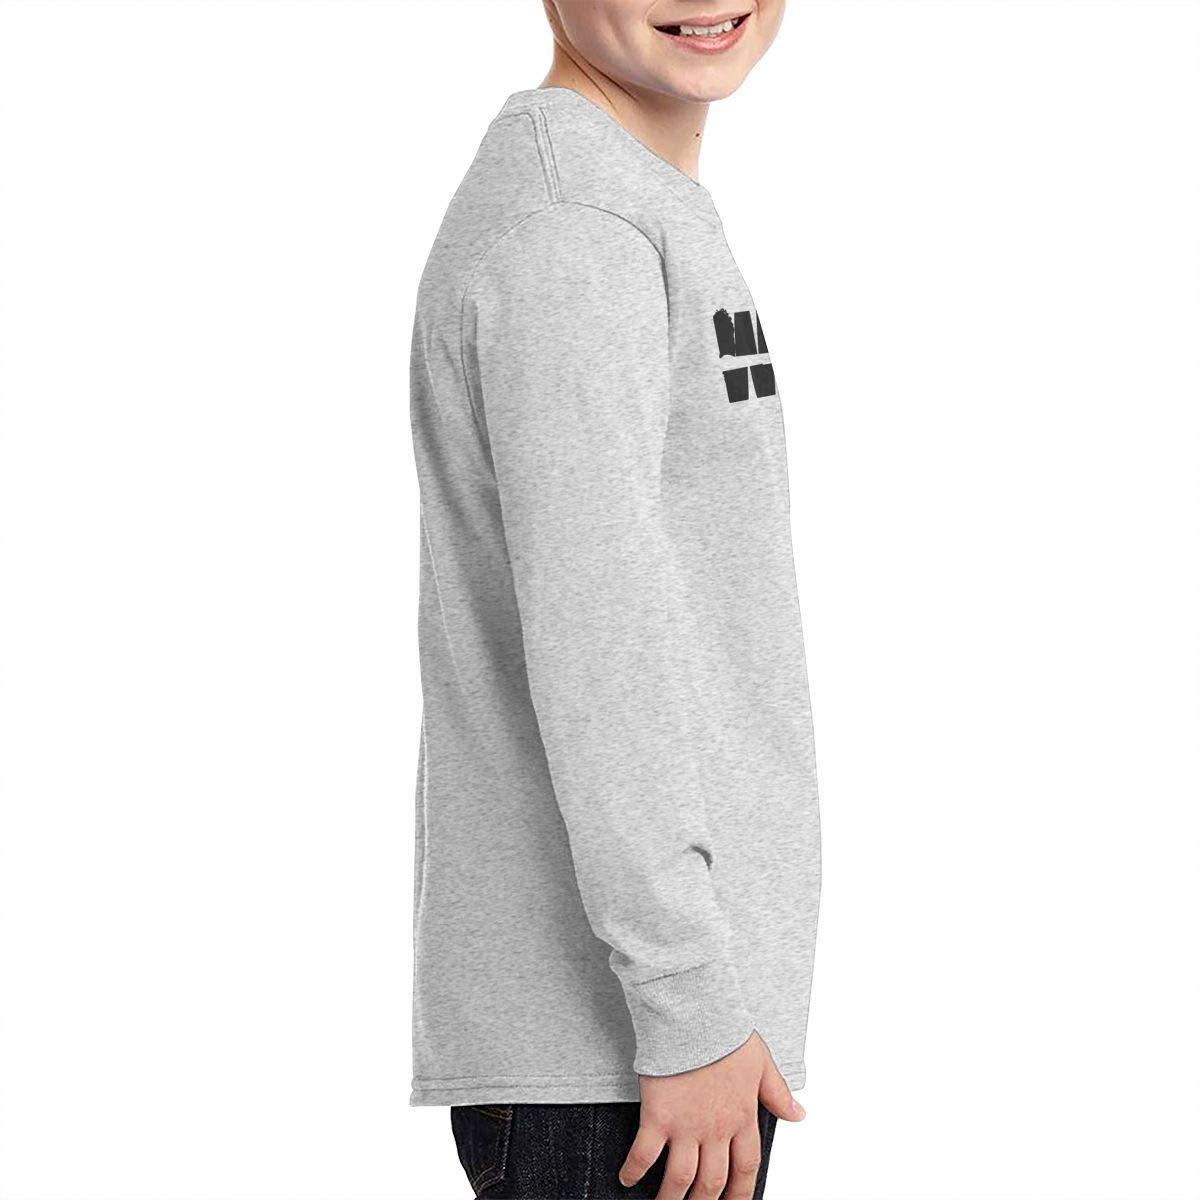 Youth WIC-KED The Musical Long Sleeves Shirt Boys Girls